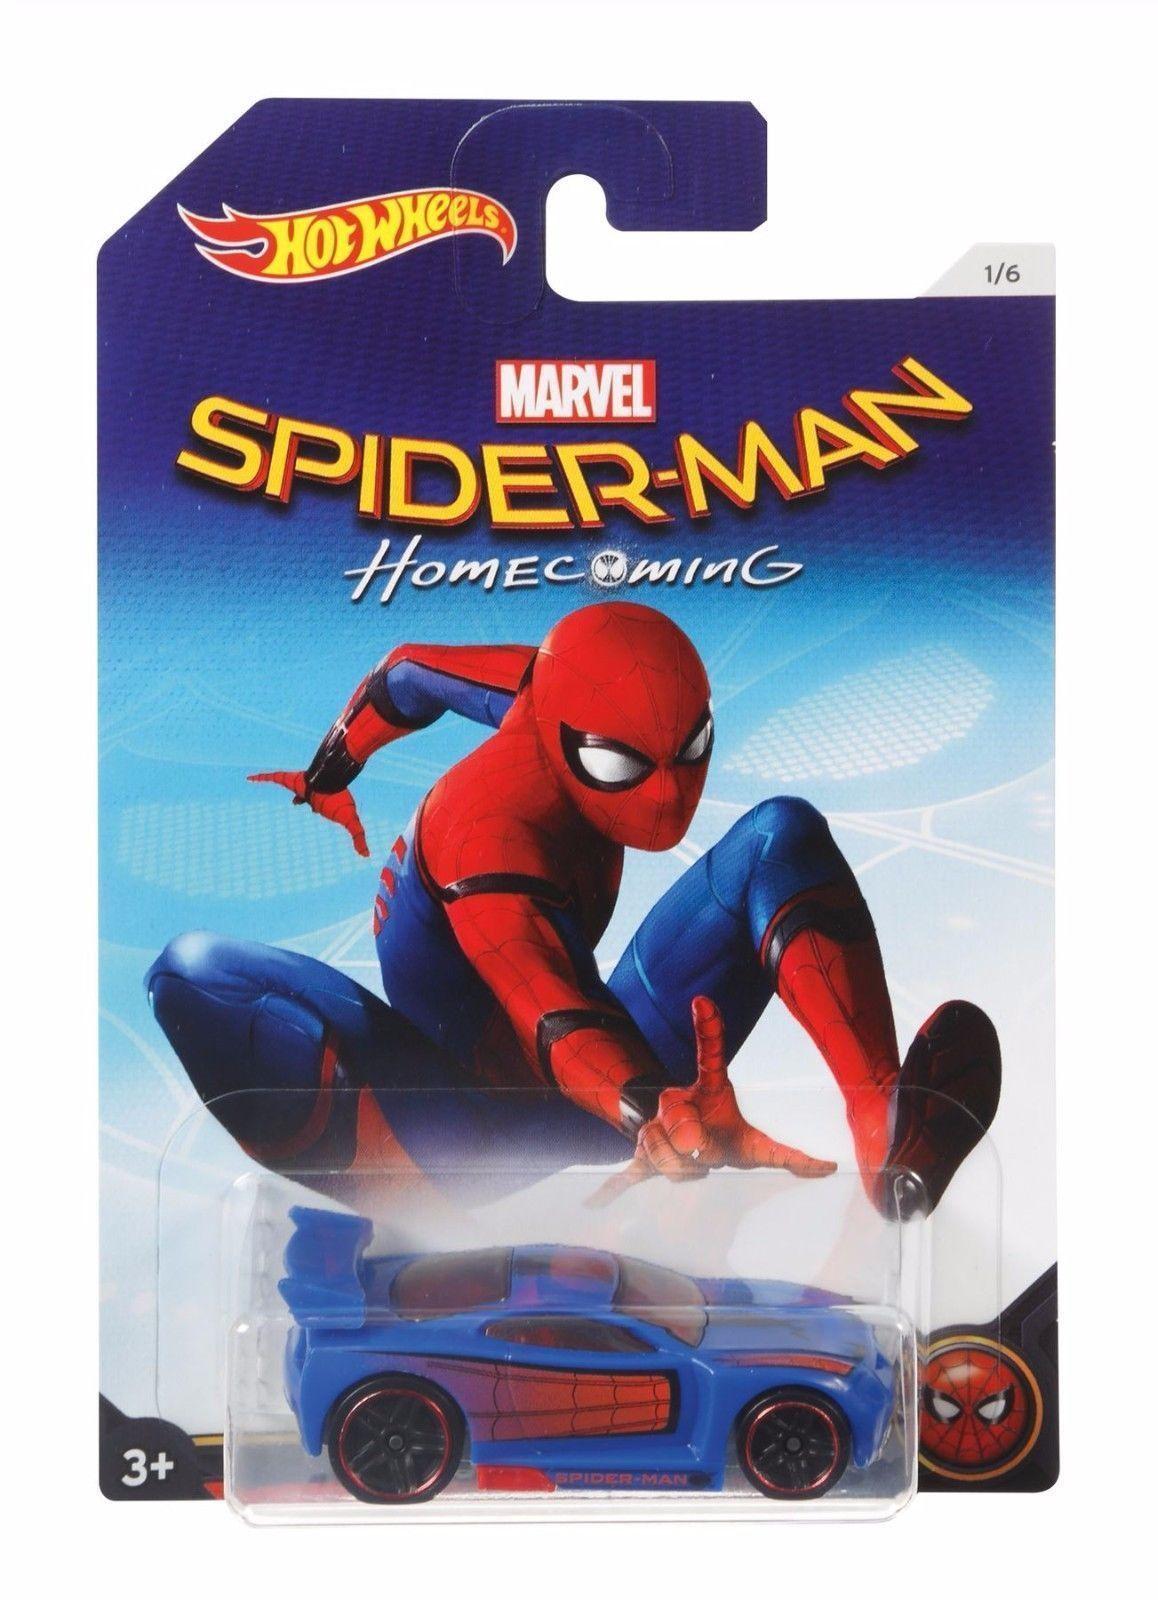 01f8fe17 £6.99 GBP - Hot Wheels Marvel Spider-Man Diecast Car - Homecoming Power Rage